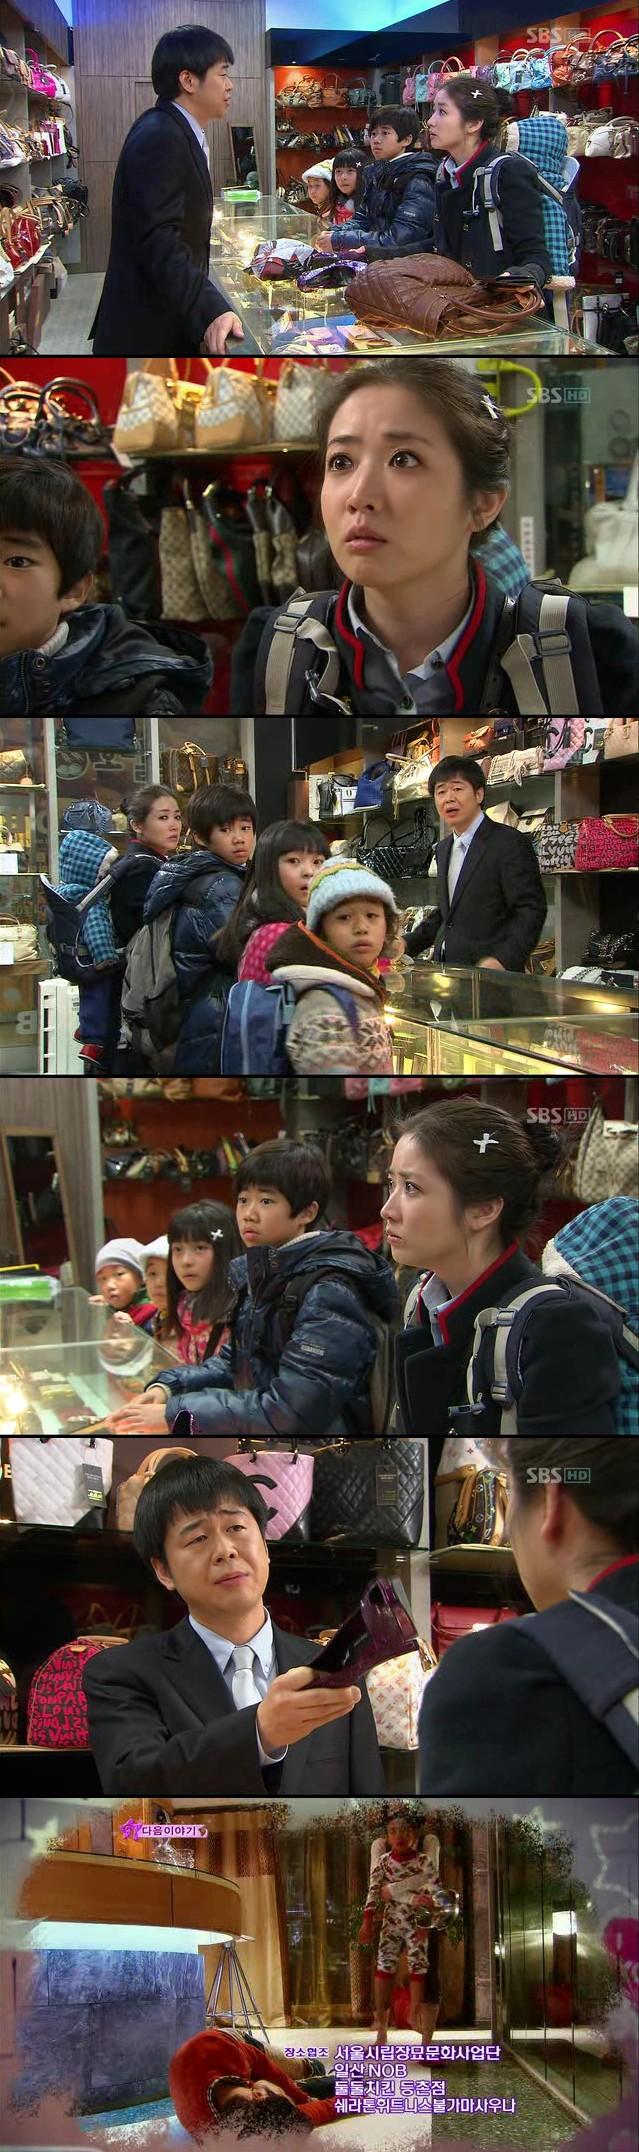 171prev wish upon a star �� ����� korean drama episode